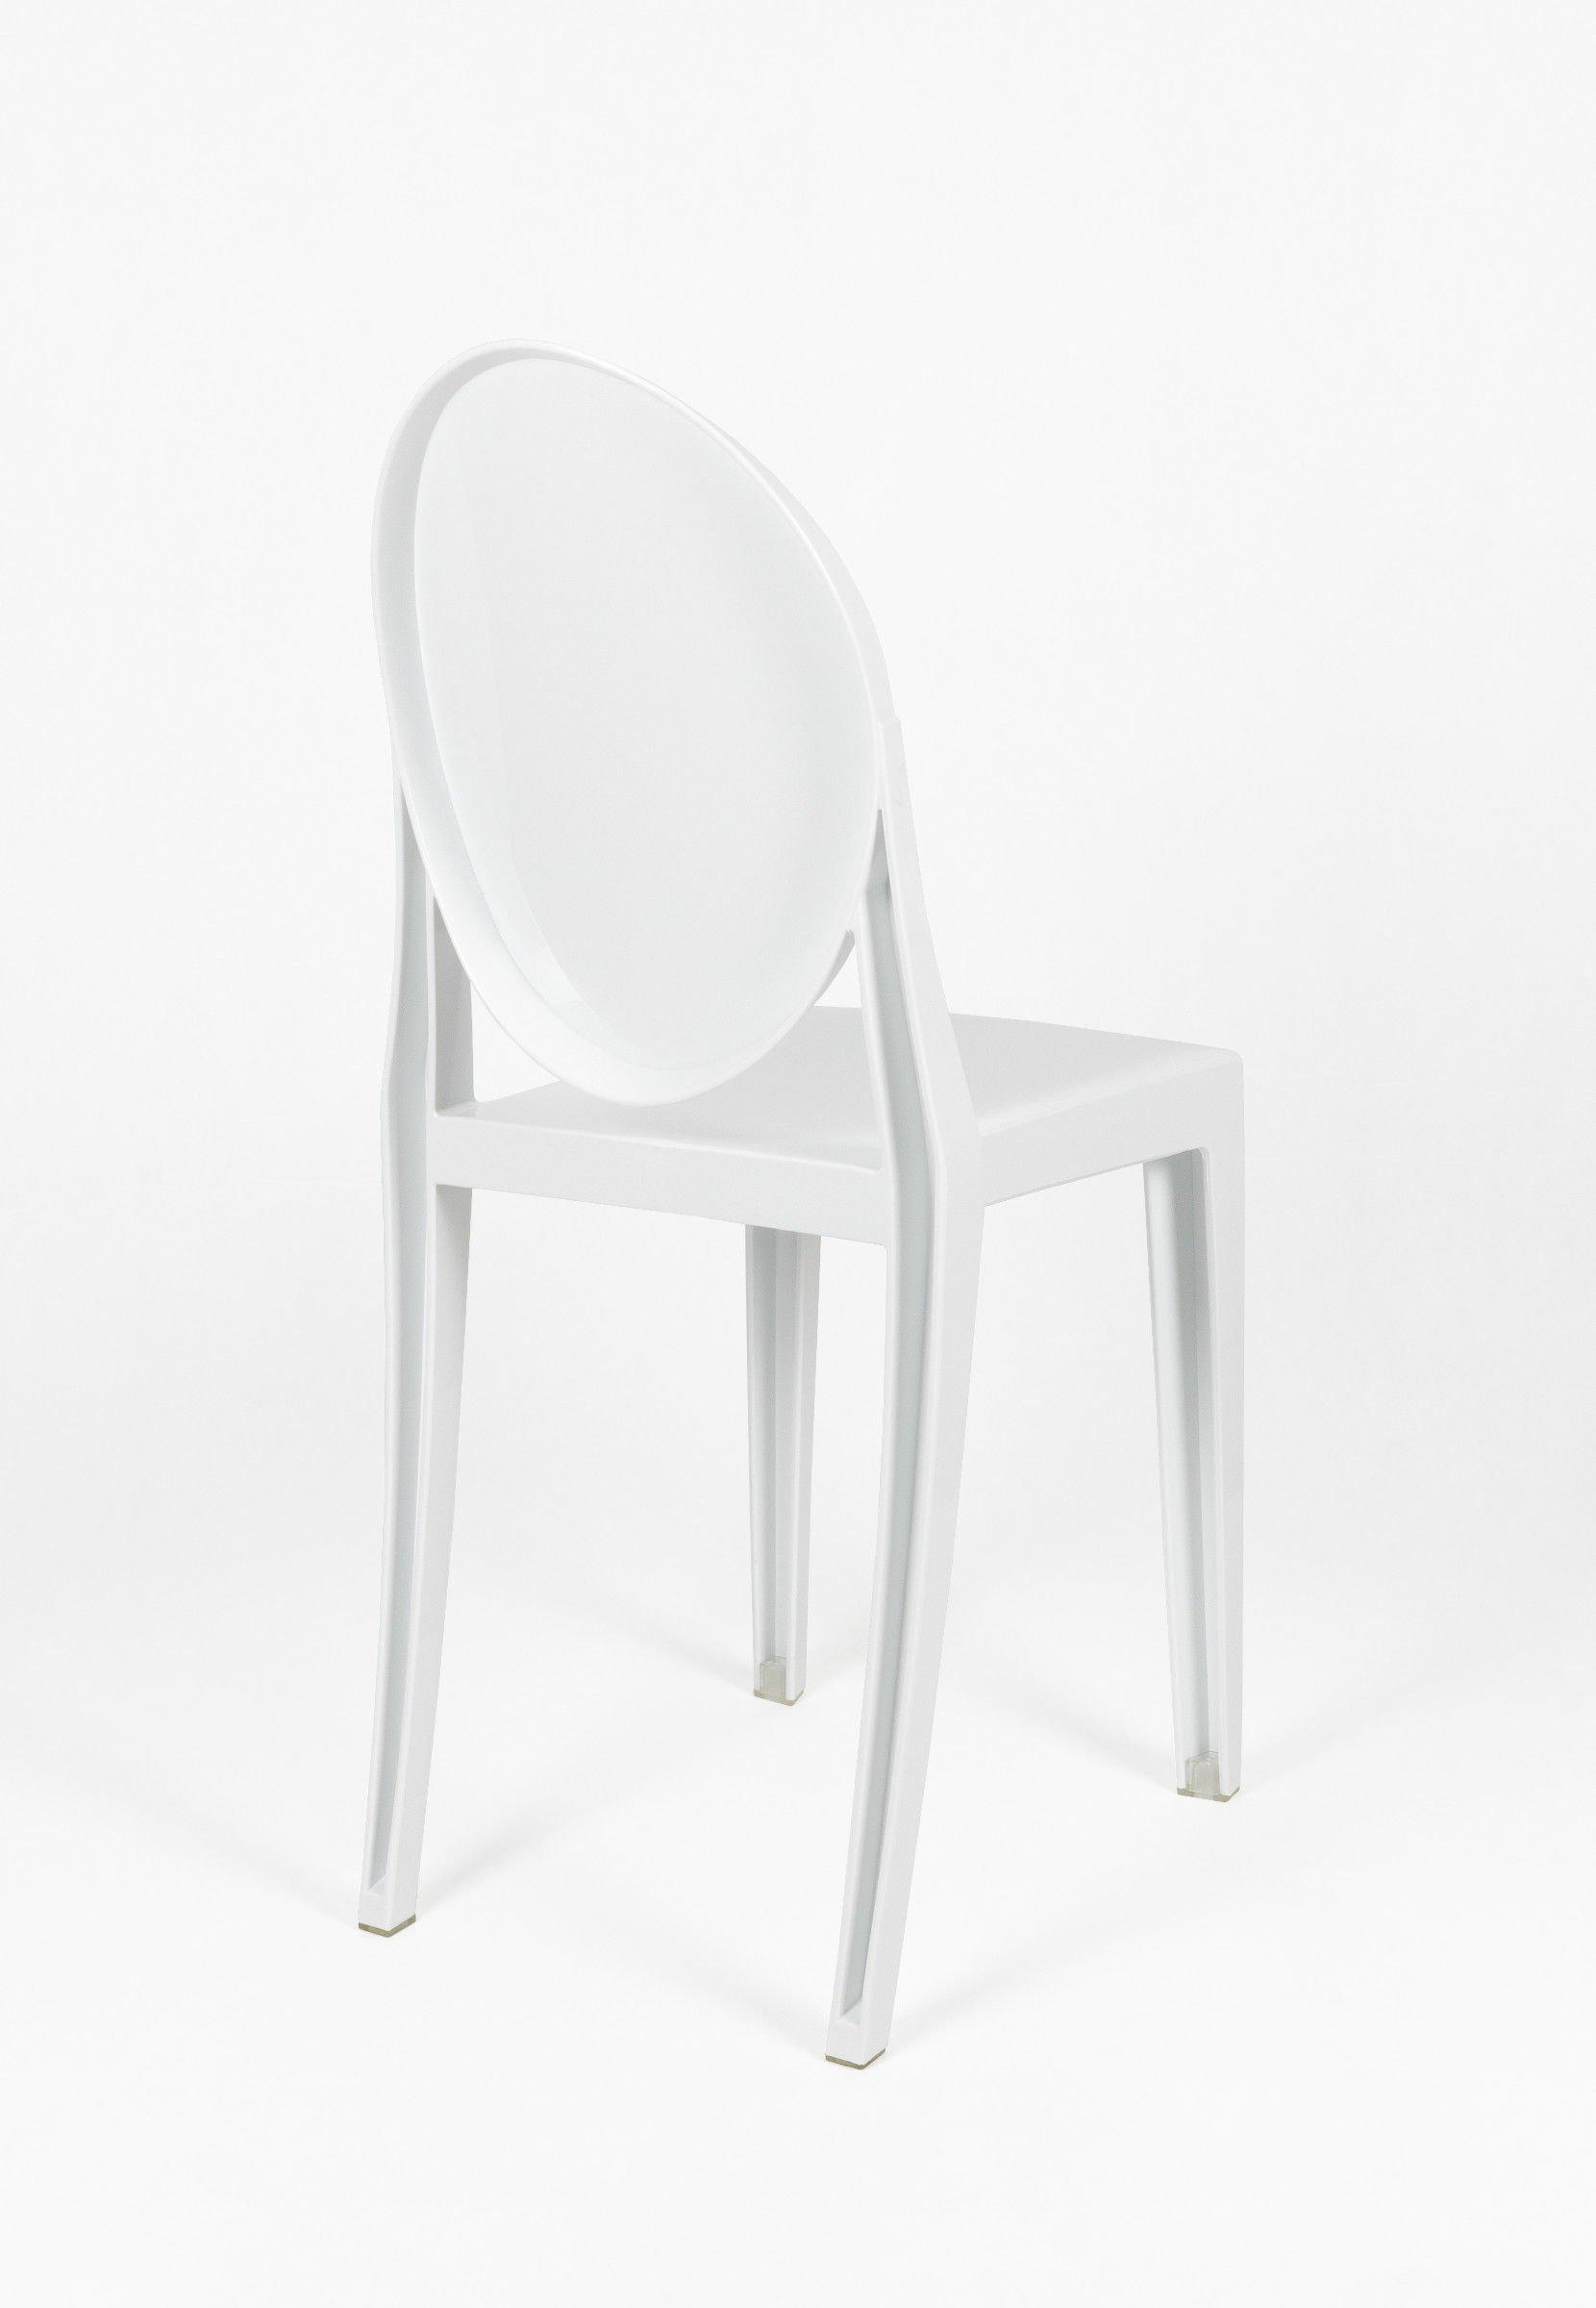 sk design kr003 weiss stuhl weiss angebot st hlen. Black Bedroom Furniture Sets. Home Design Ideas